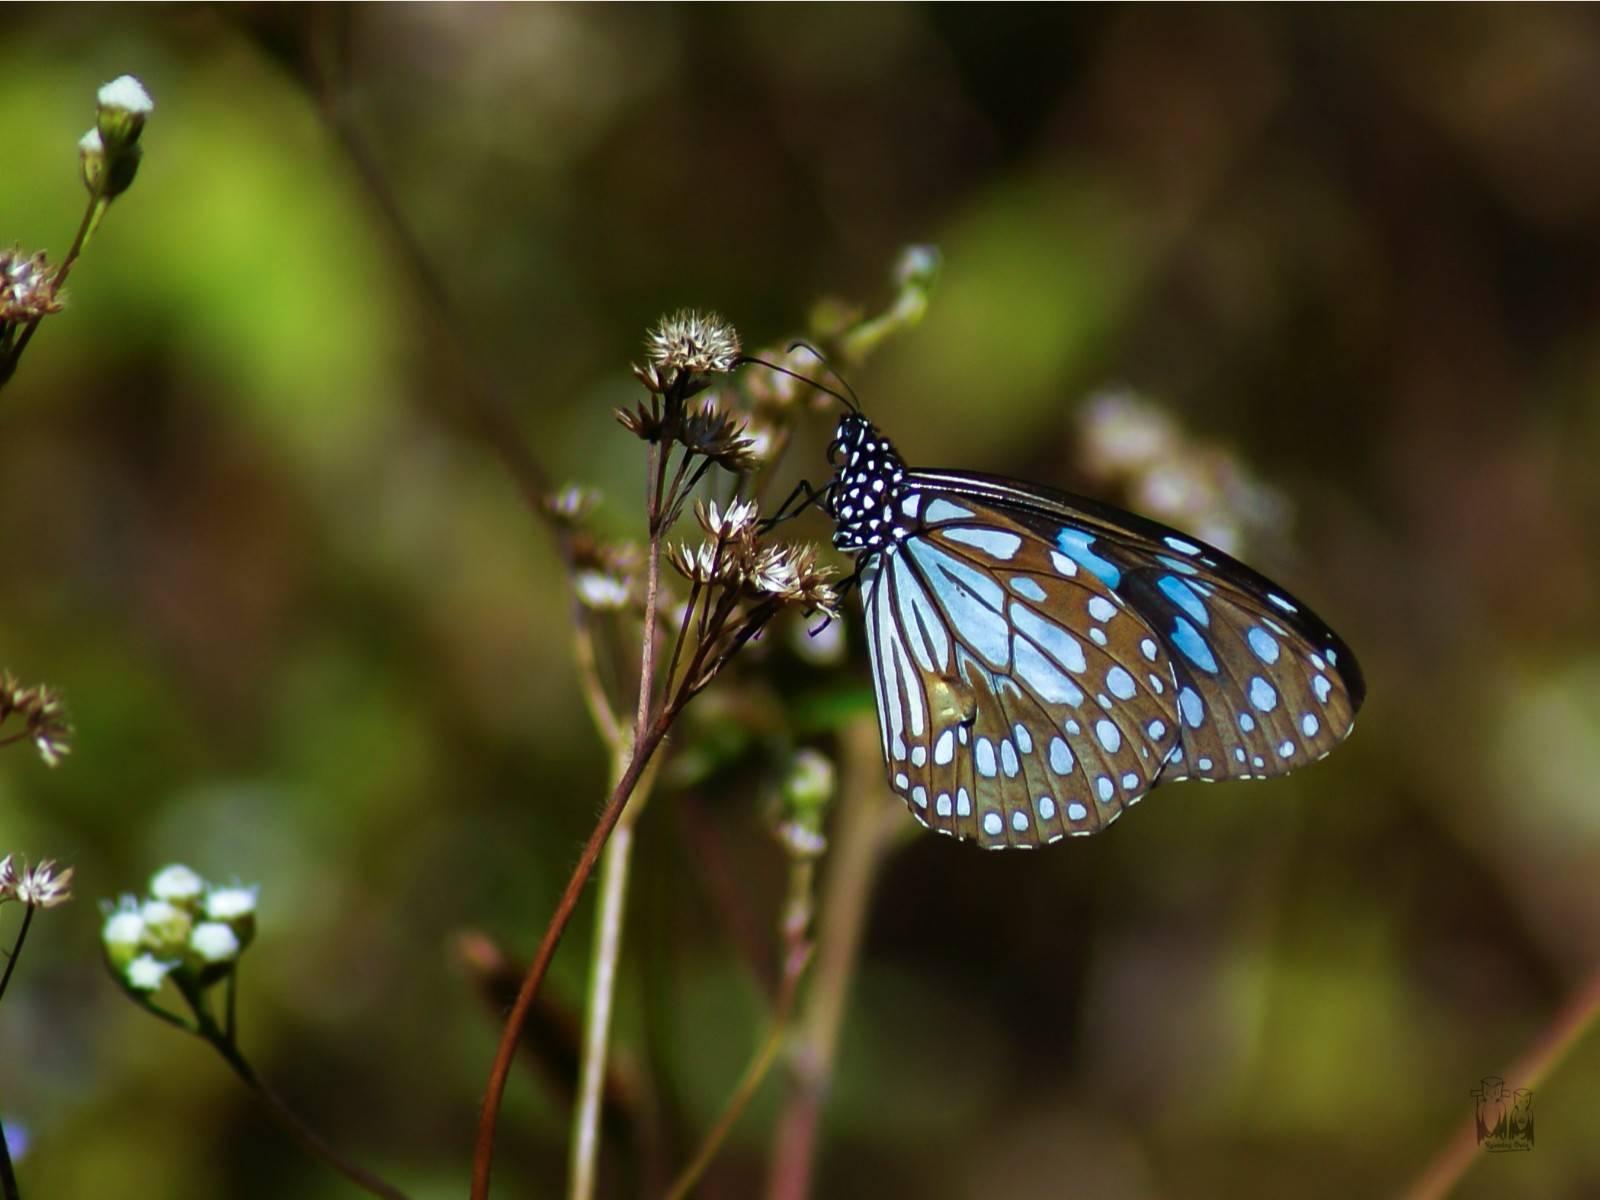 Tirumala limniace,Blue Tiger,karimala trek,parambikulam tiger reserve,goat weed,Epimedium